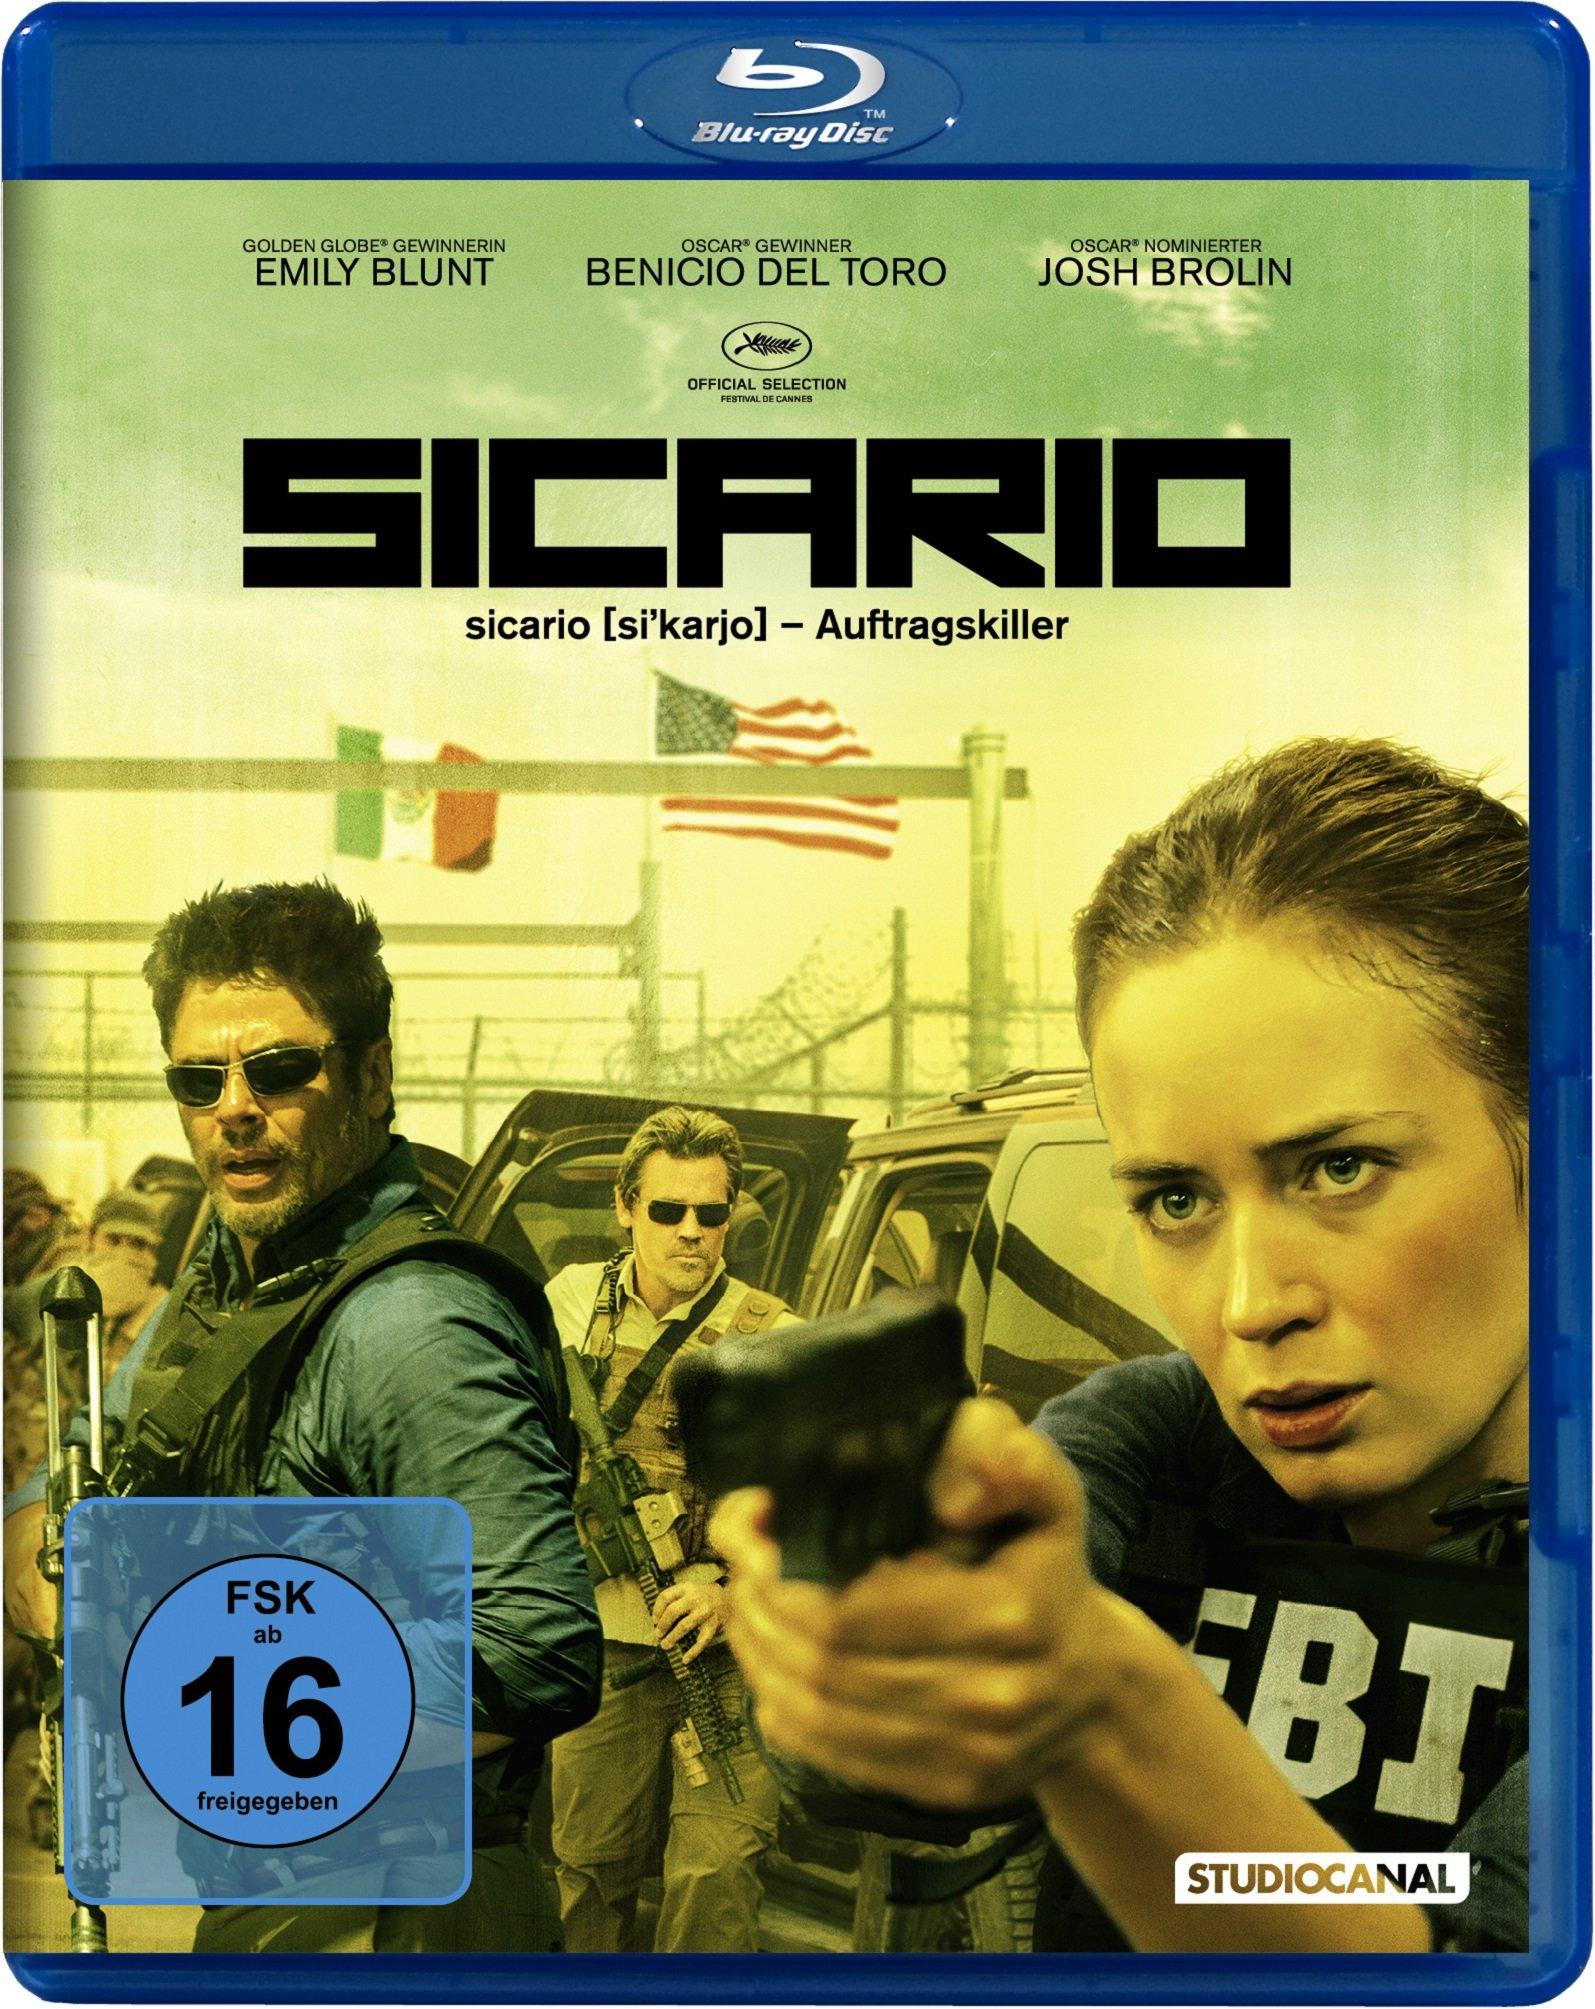 Sicario.2015.German.DTS.DL.1080p.BluRay.x265-UNFIrED